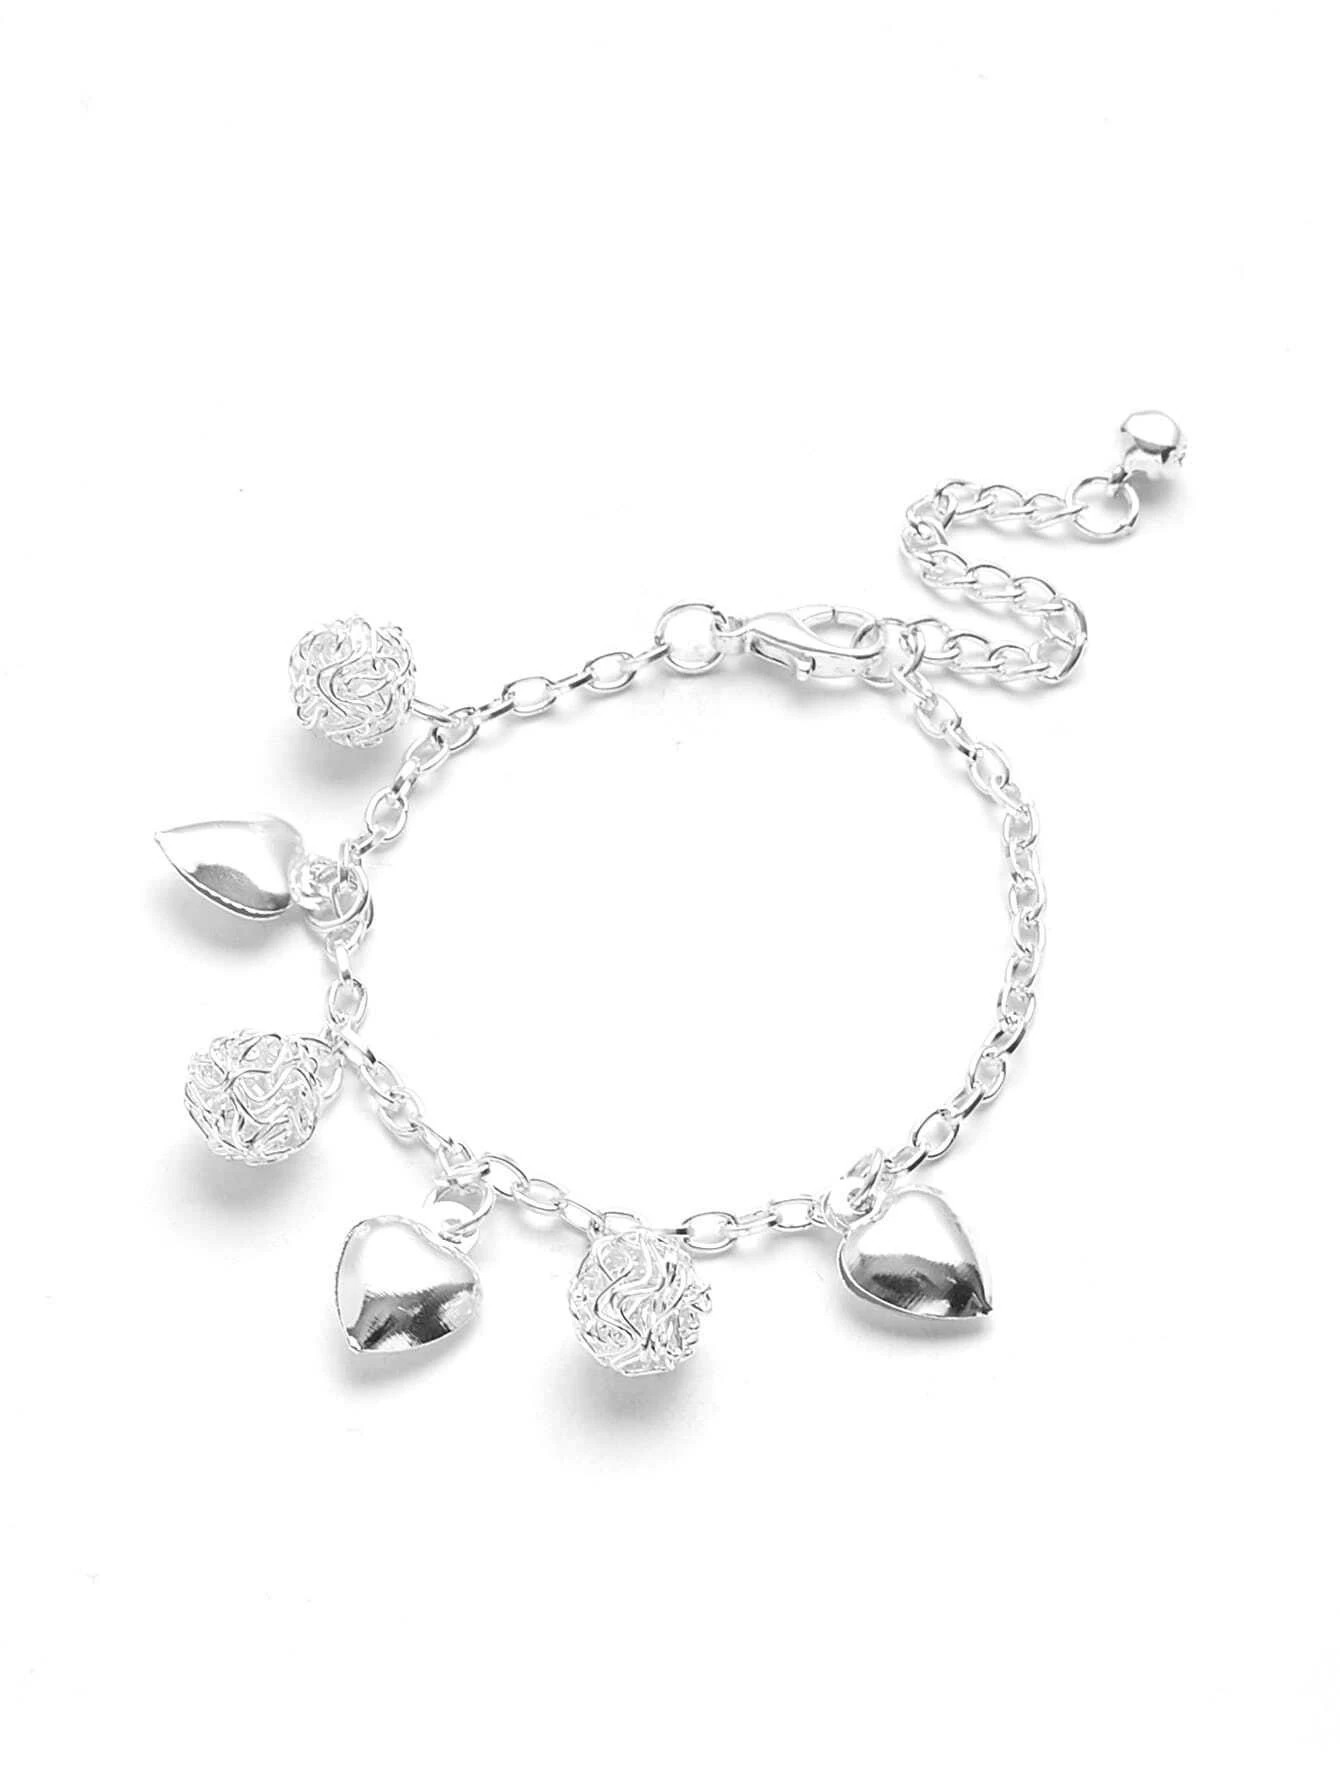 Hearts pattern bracelet